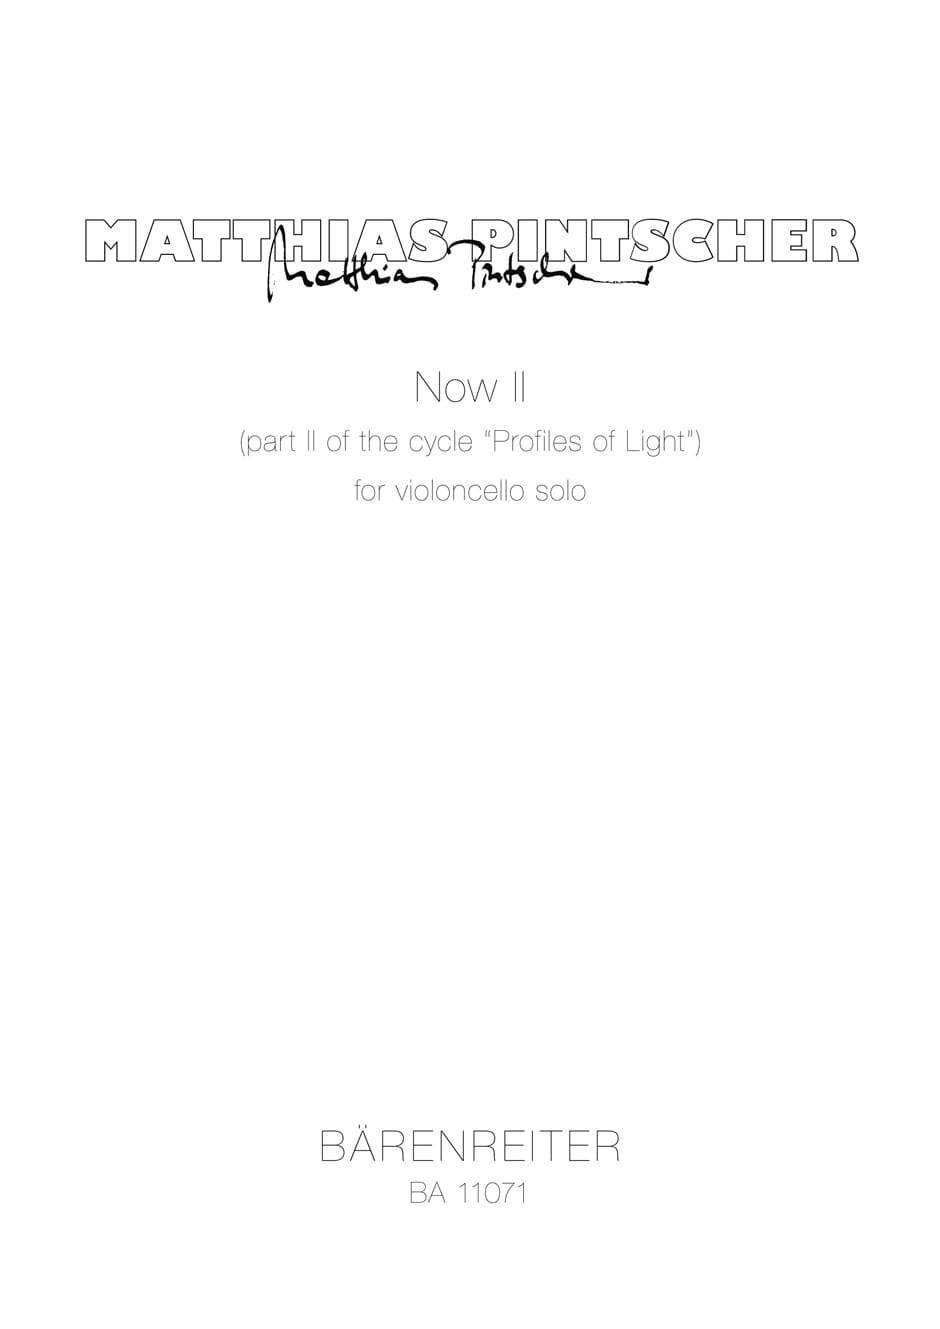 Now II for violoncello solo - Matthias Pintscher - laflutedepan.com